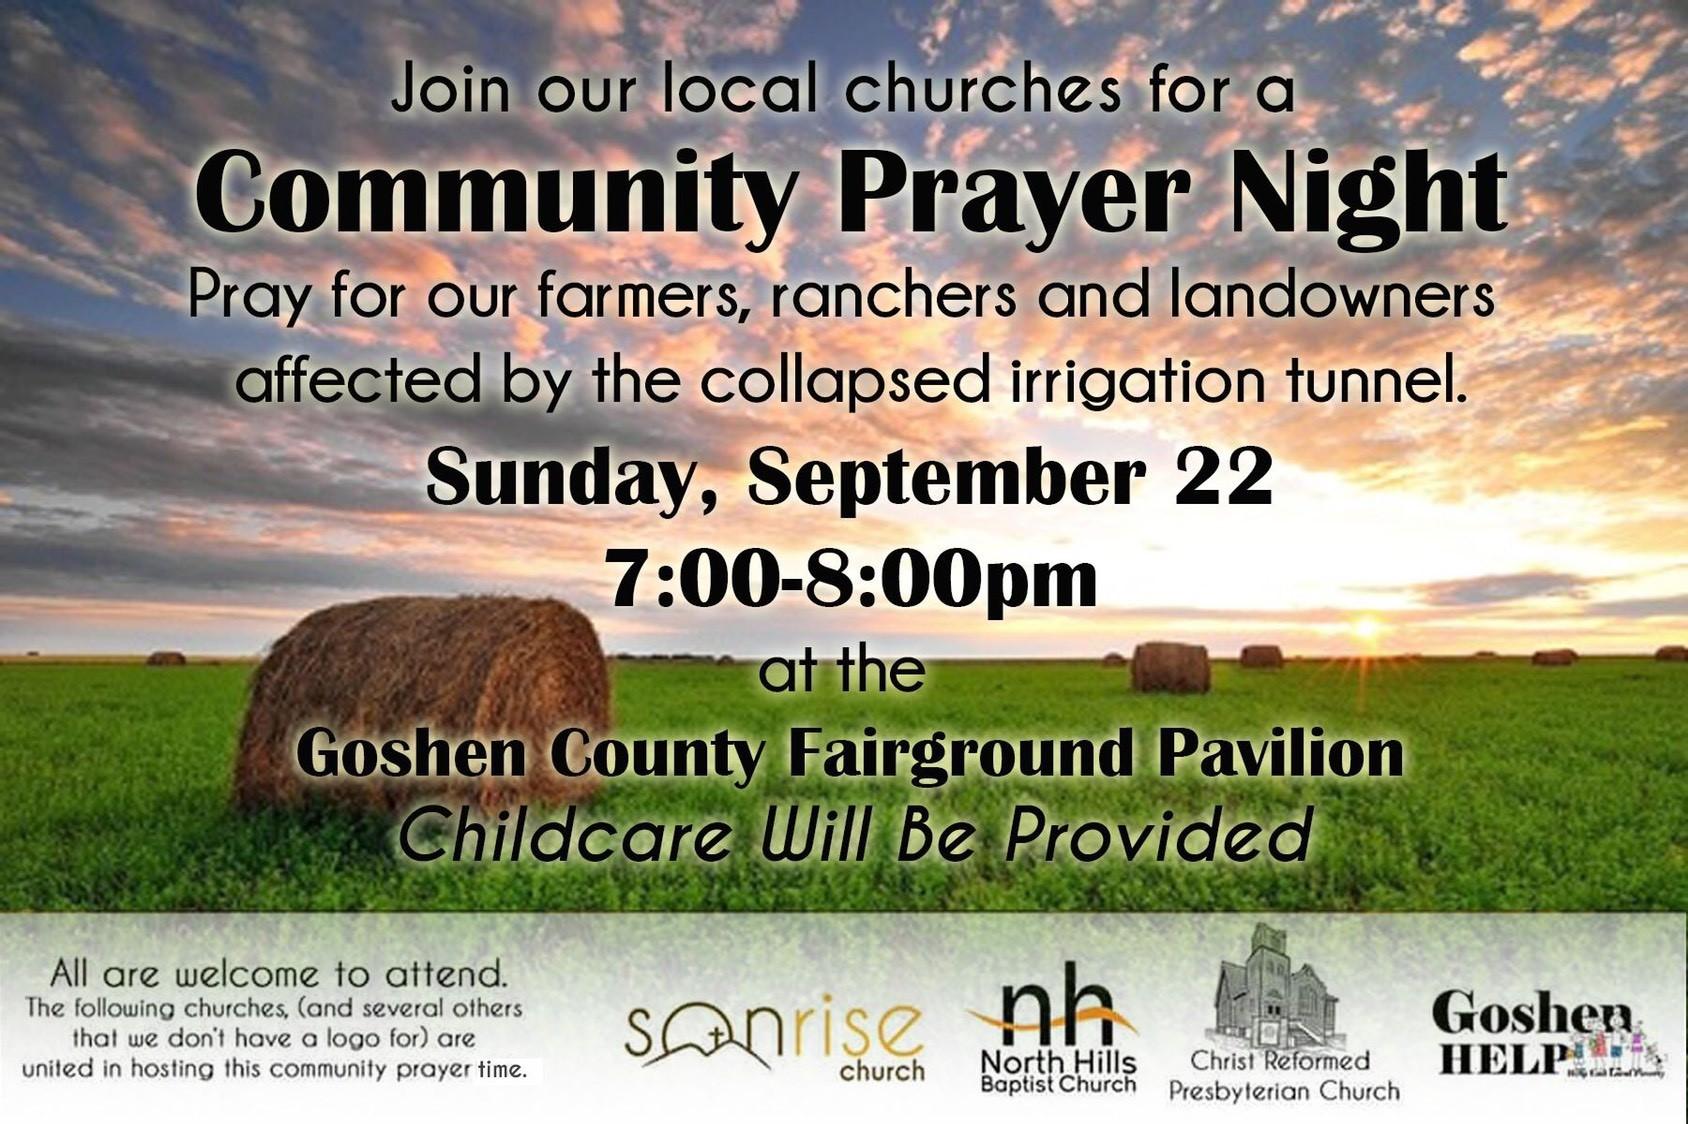 Community Prayer Night Photo